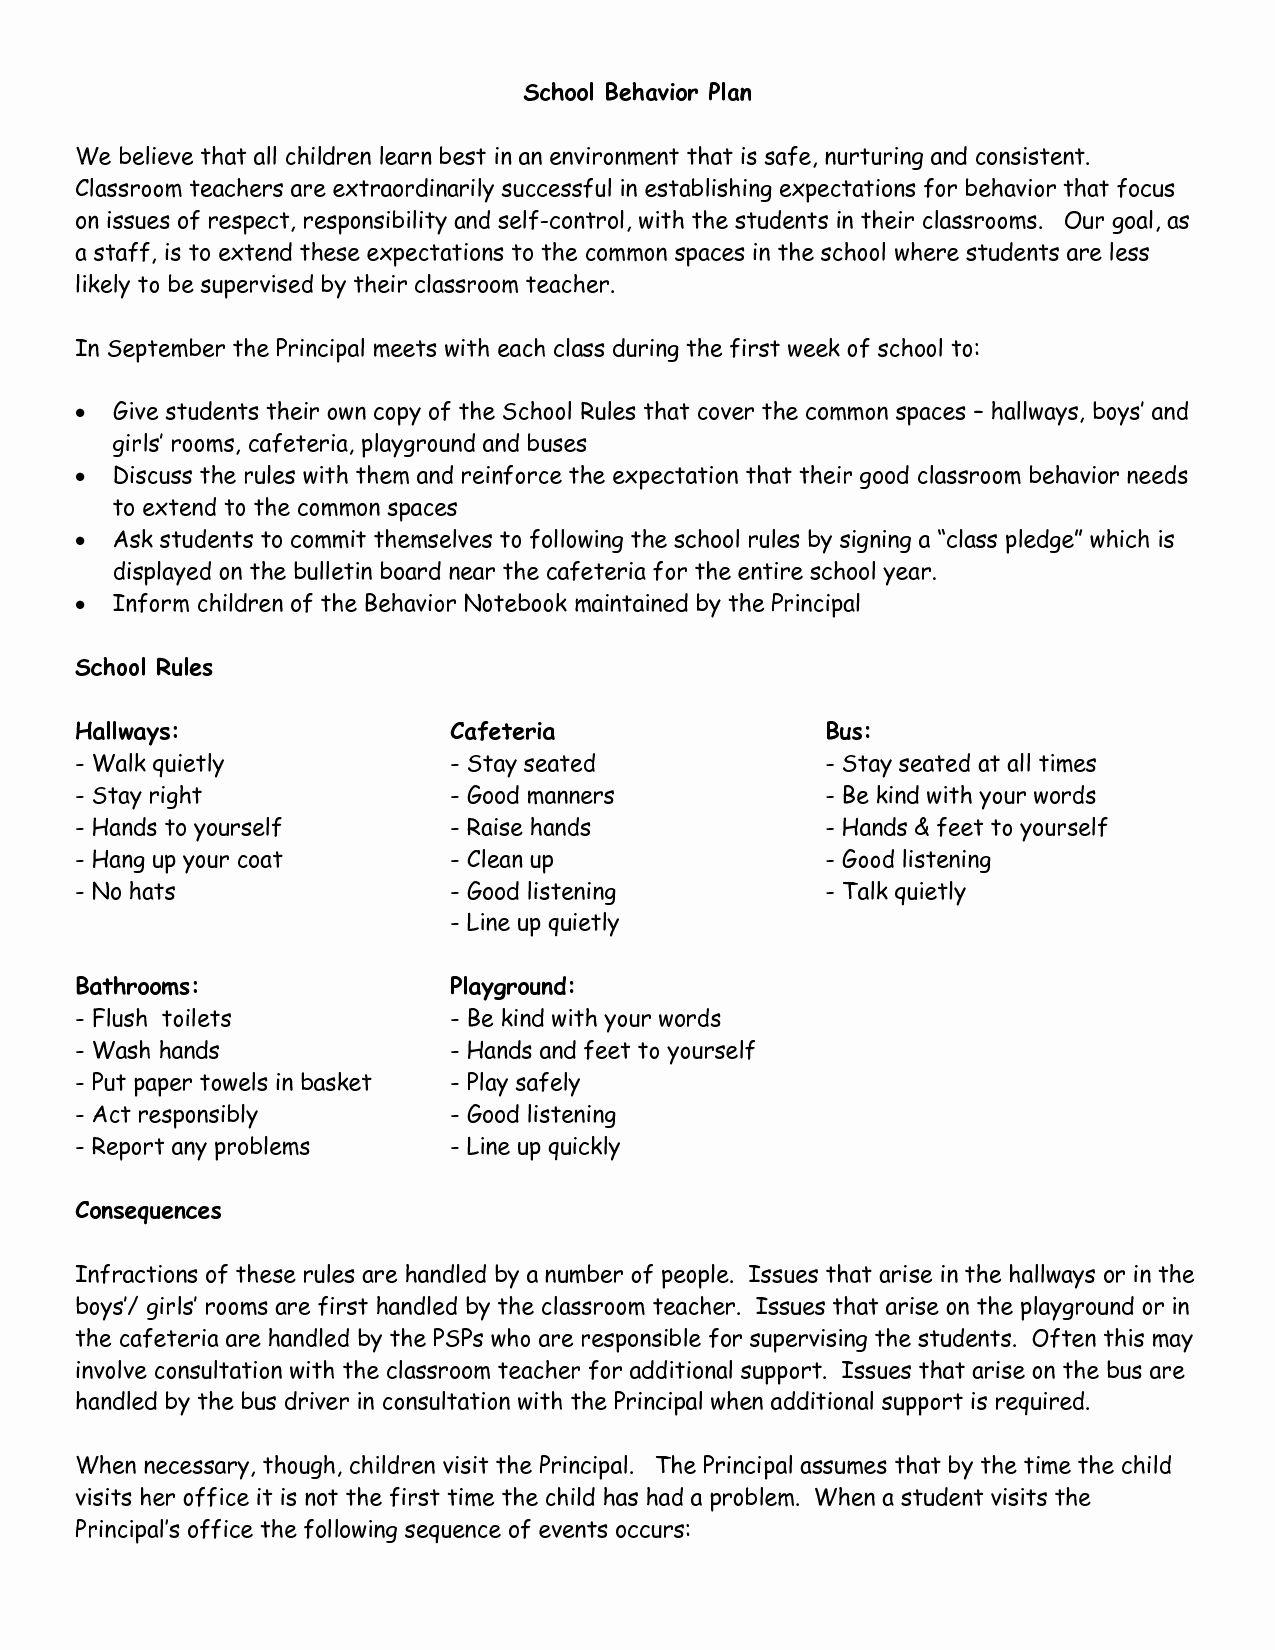 Classroom Management Plan Template Elementary Luxury School Wide Examples Discipline Plan Classroo Classroom Management Plan Behavior Plan Classroom Management